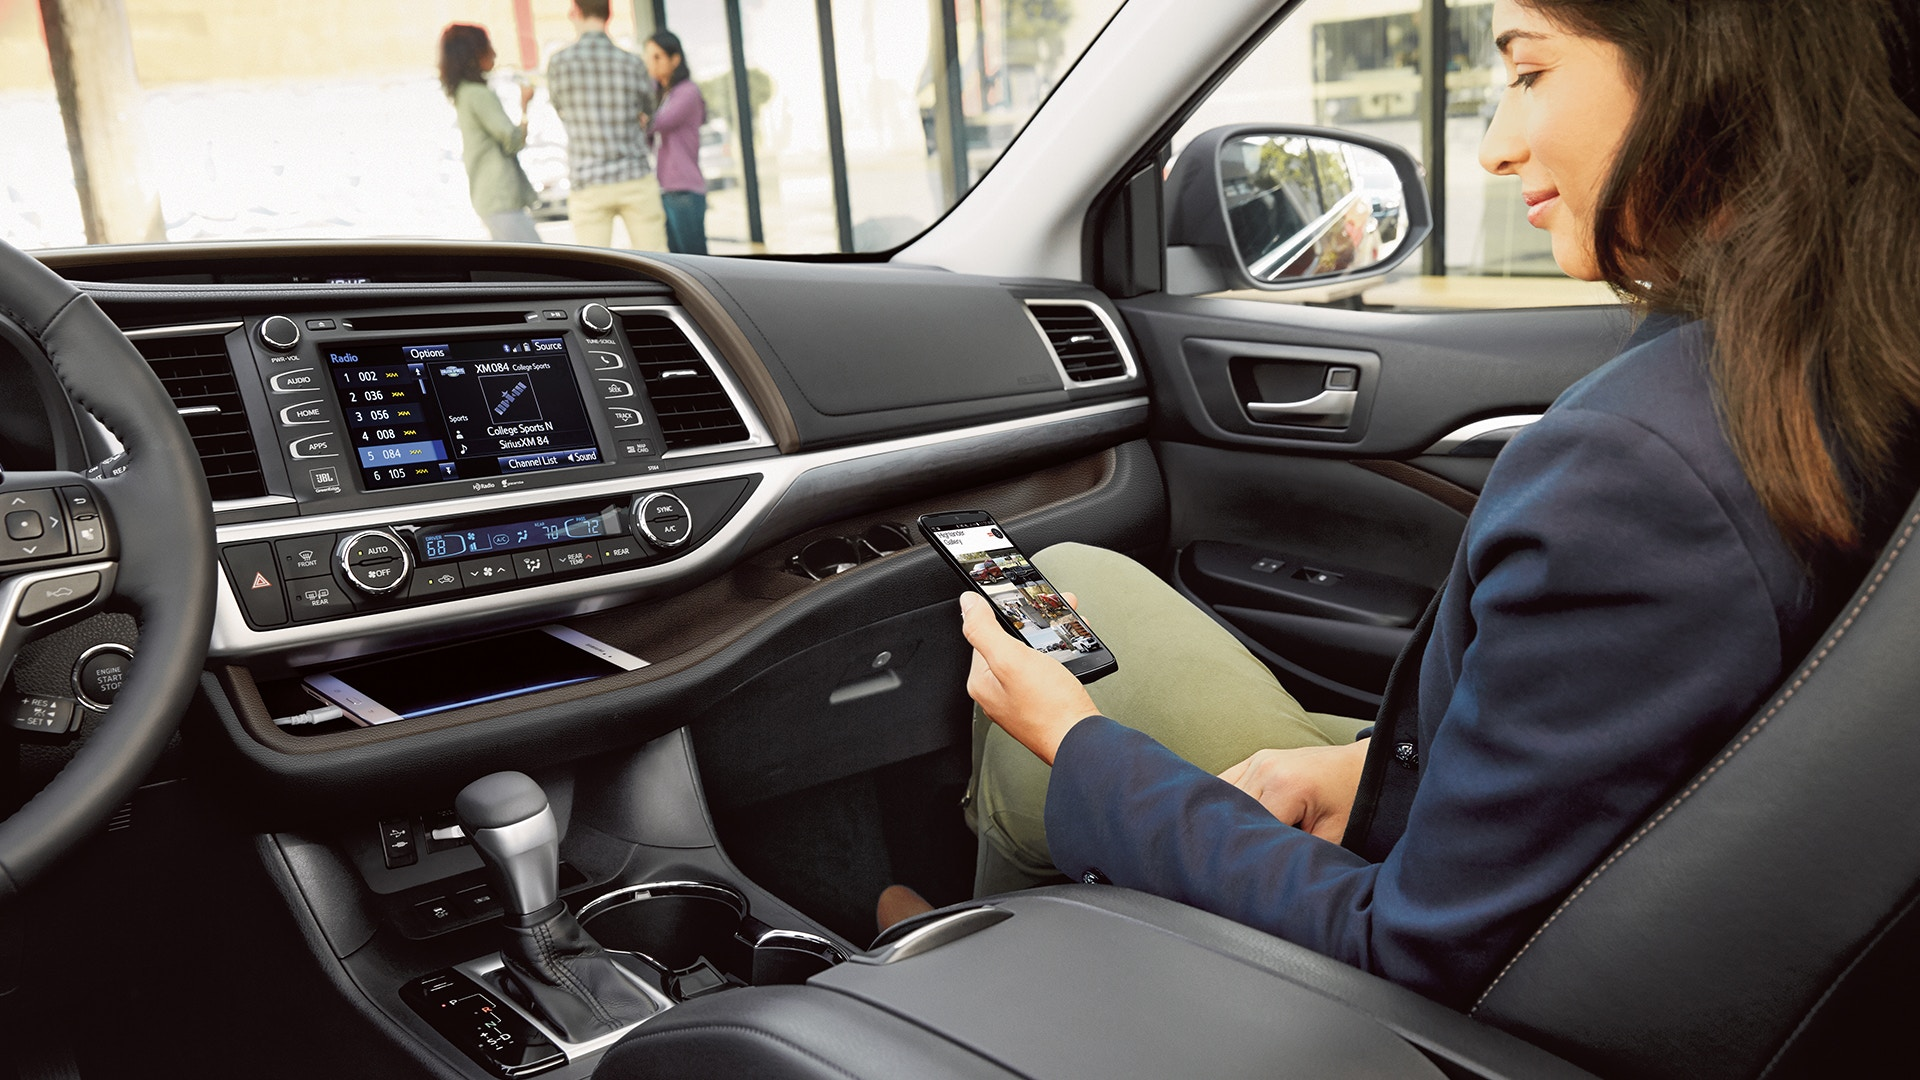 2019 Toyota Highlander Center Console